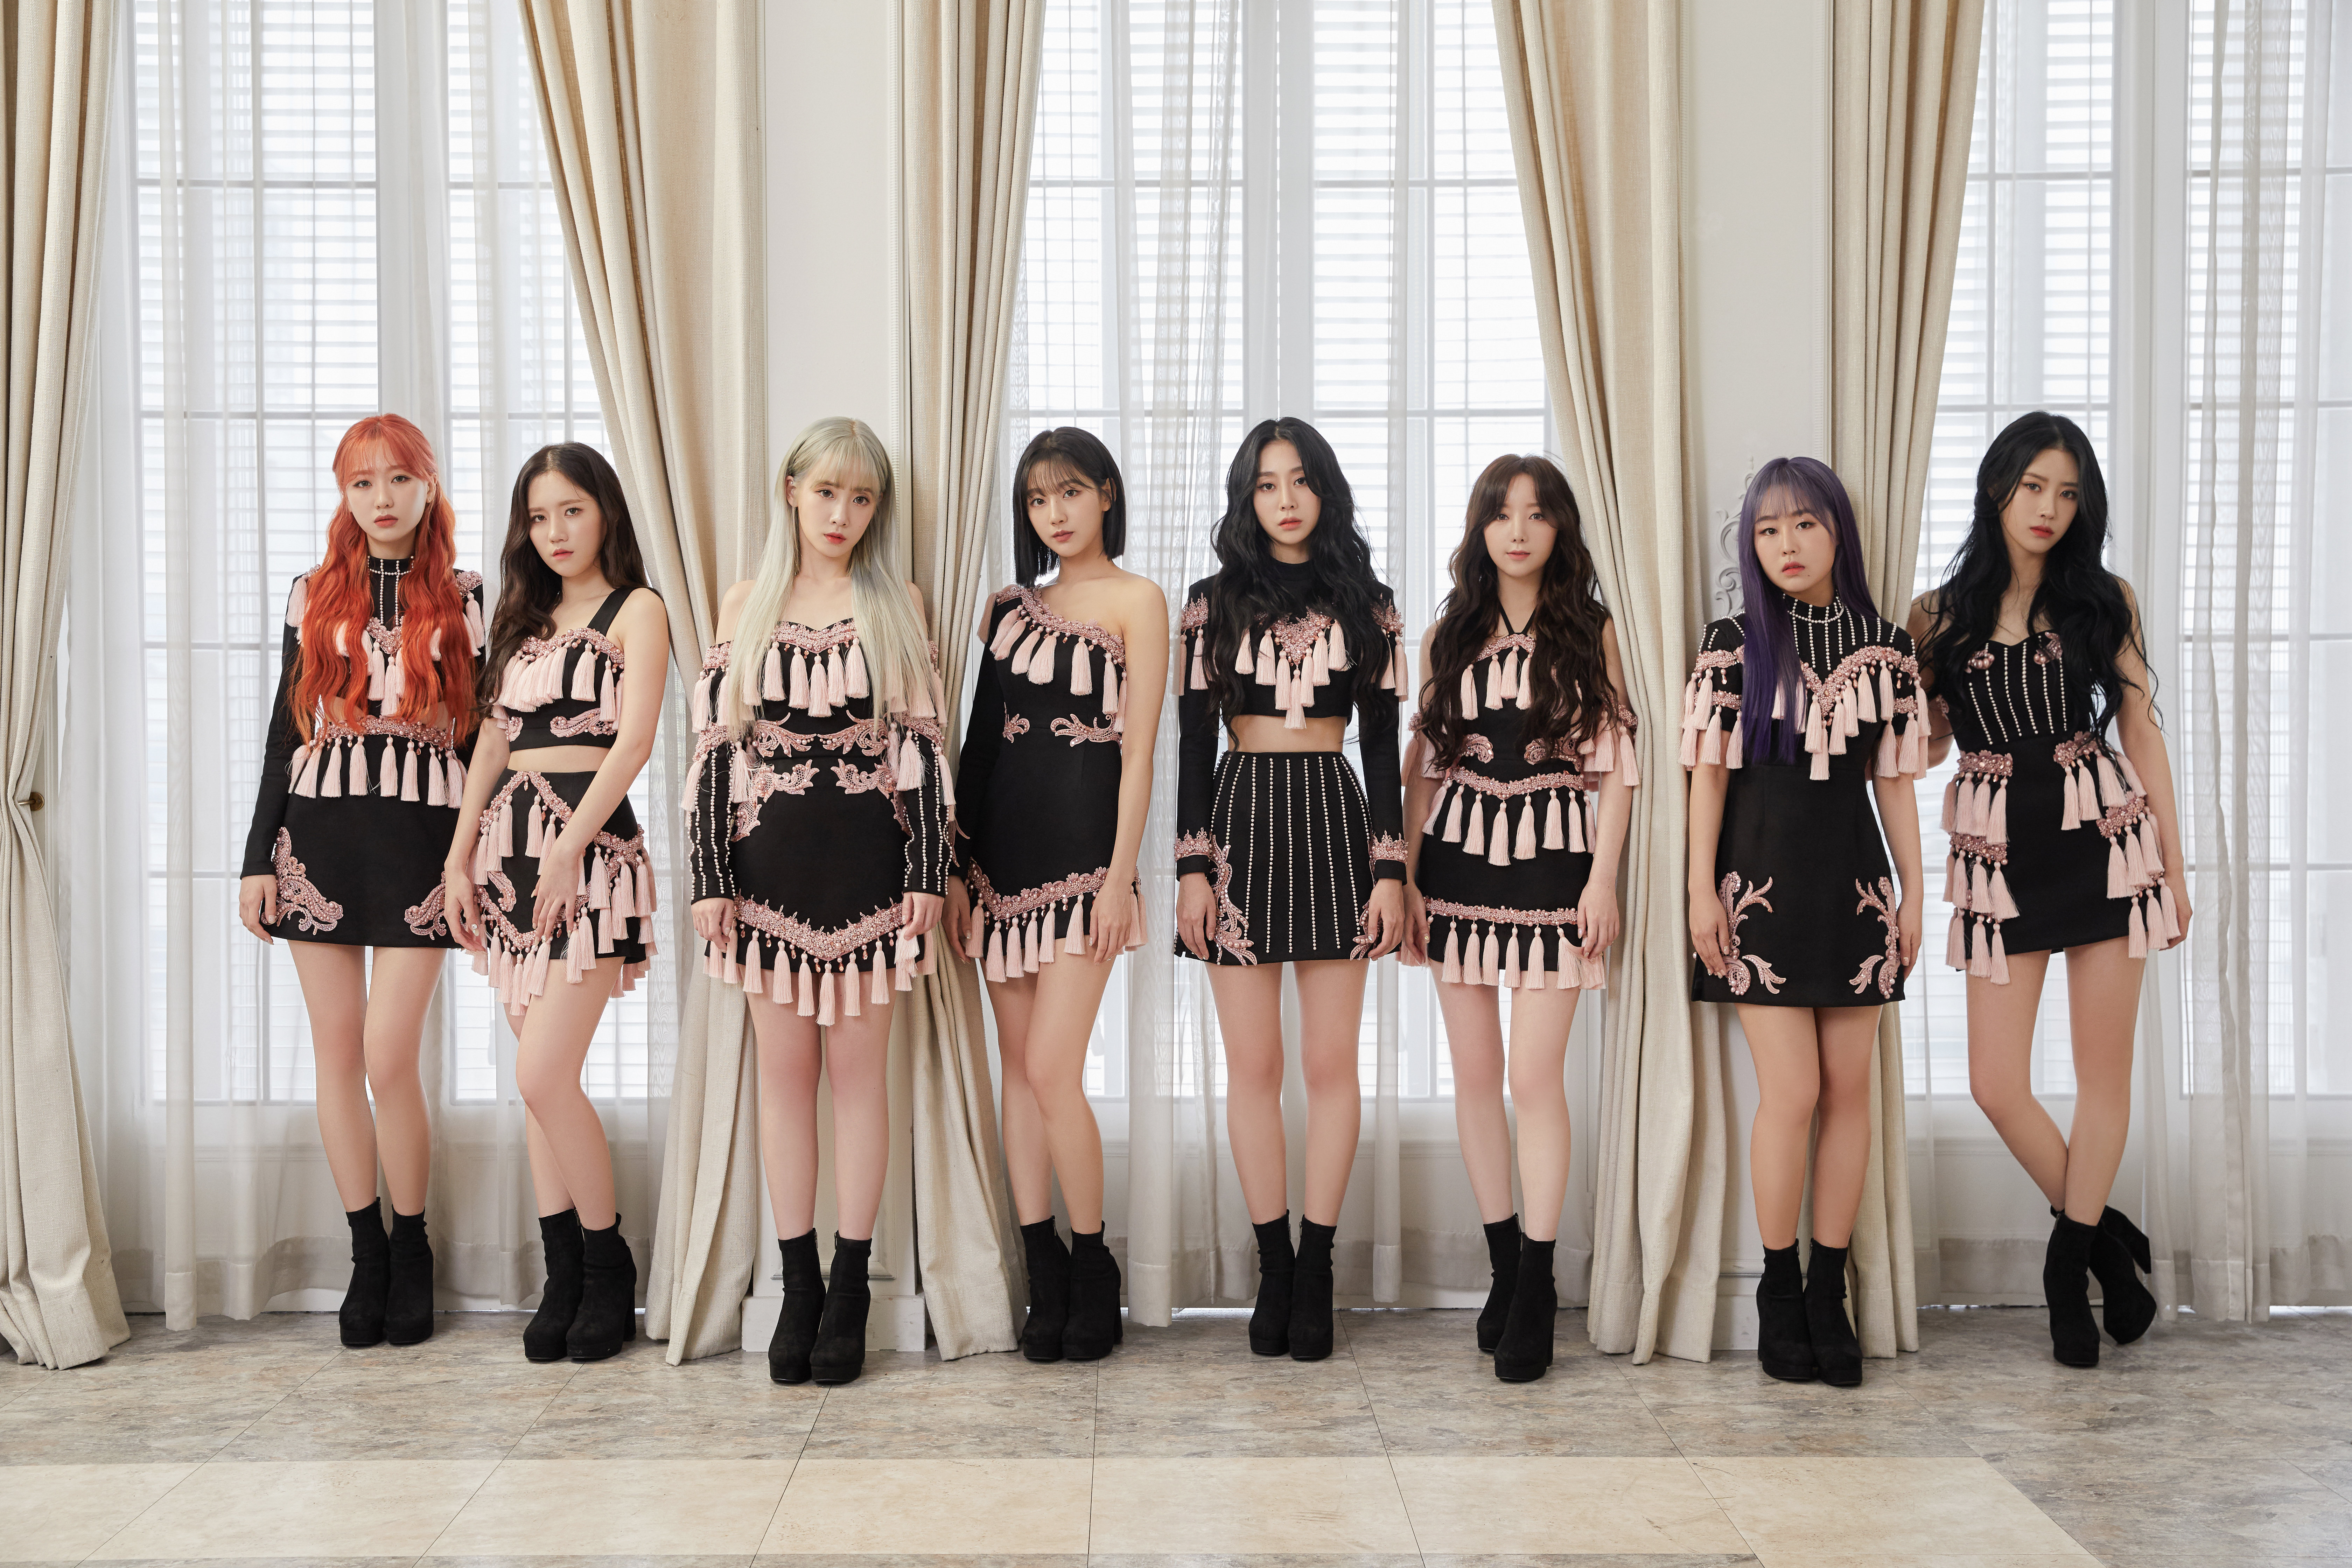 Lovelyz Unforgettable Concept Group